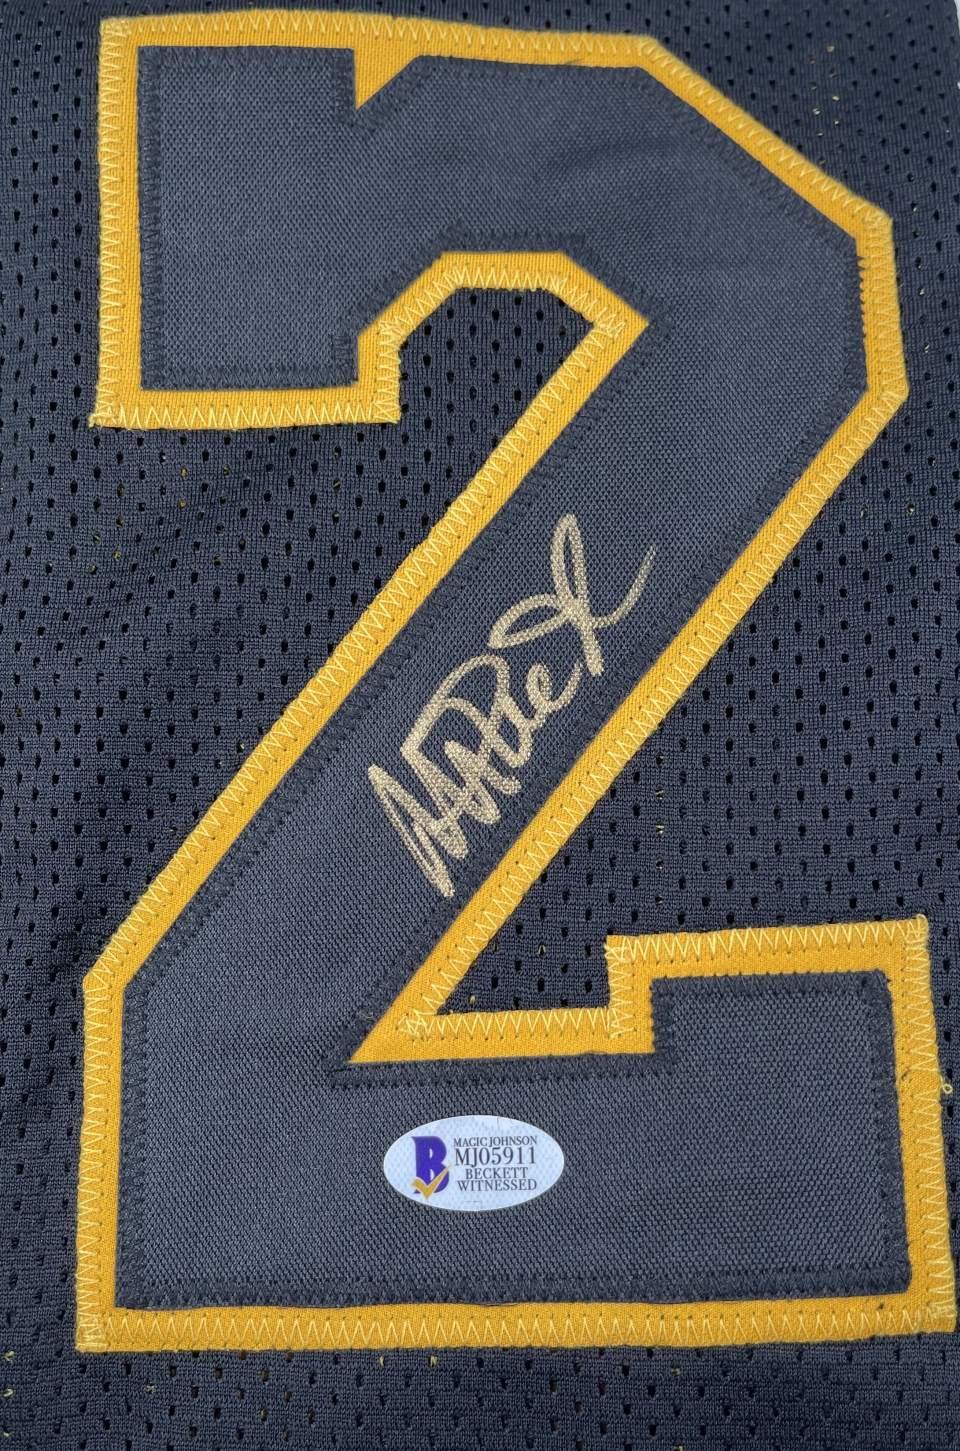 Magic Johnson Signed Black Pro Style Jersey Black Numbers Gold Trim [BAS MJ05911]